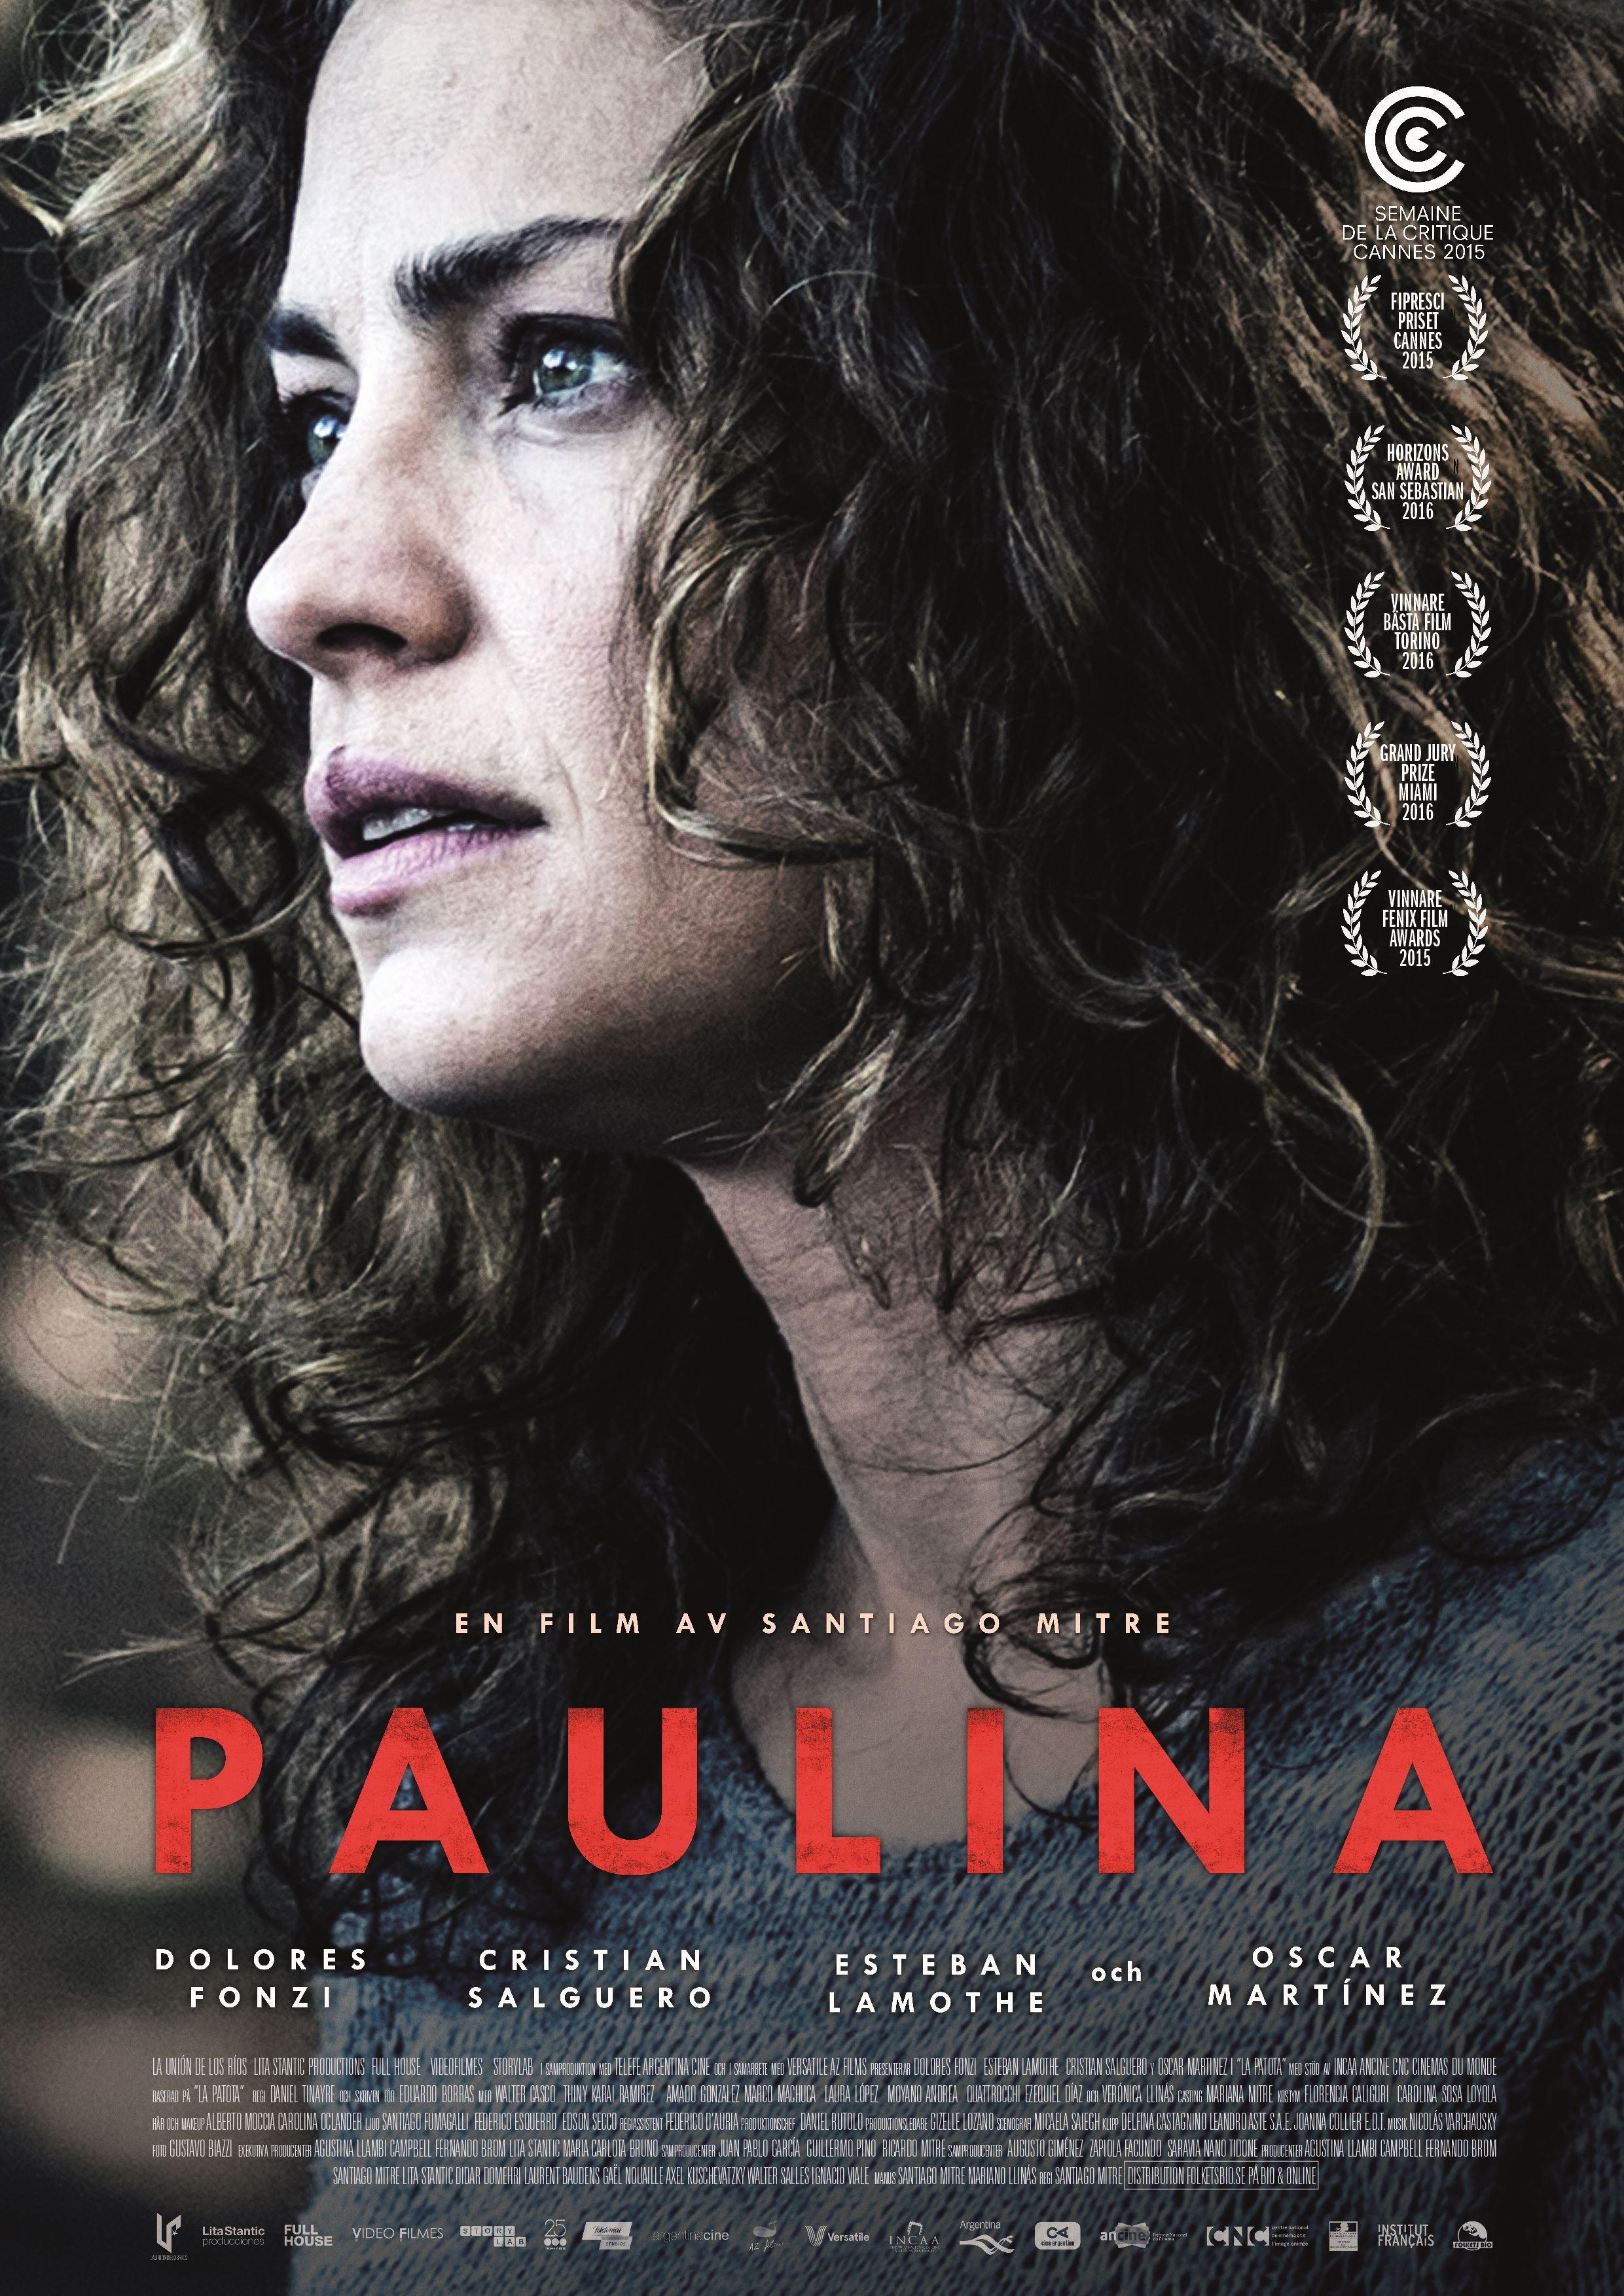 Bio: Paulina